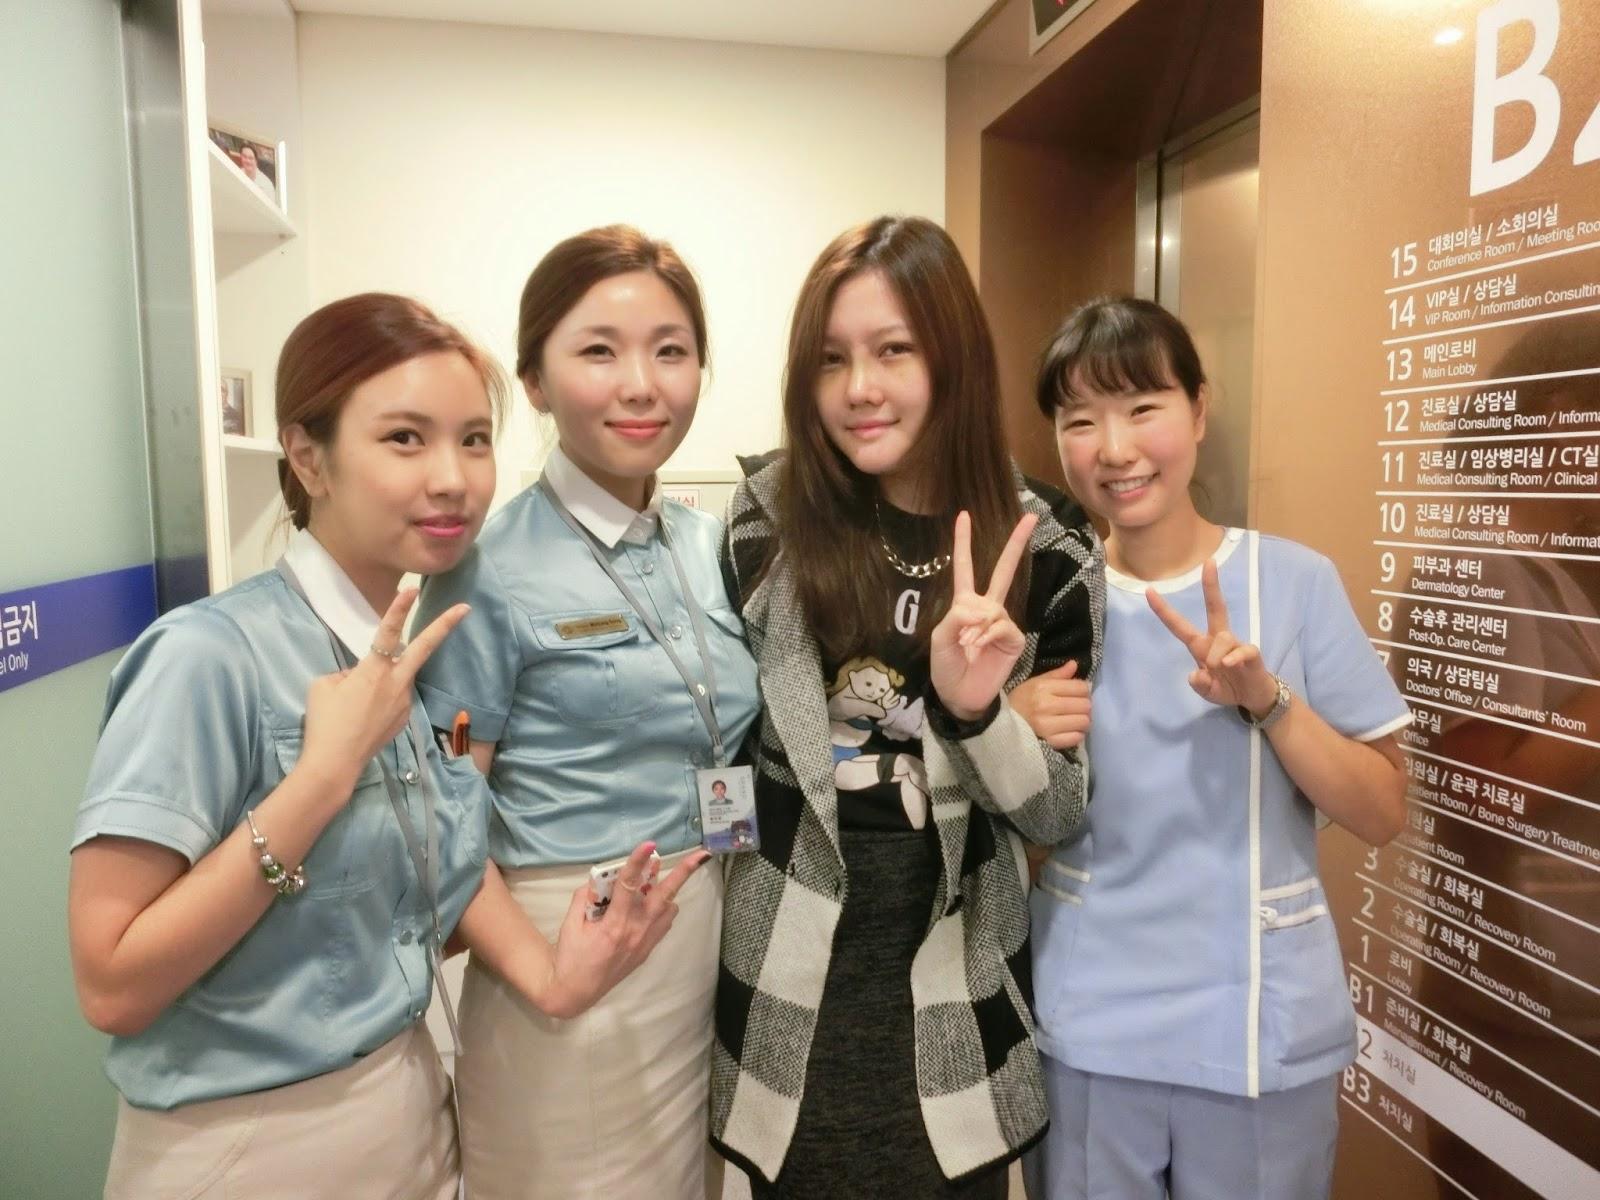 grand-staff-nurses